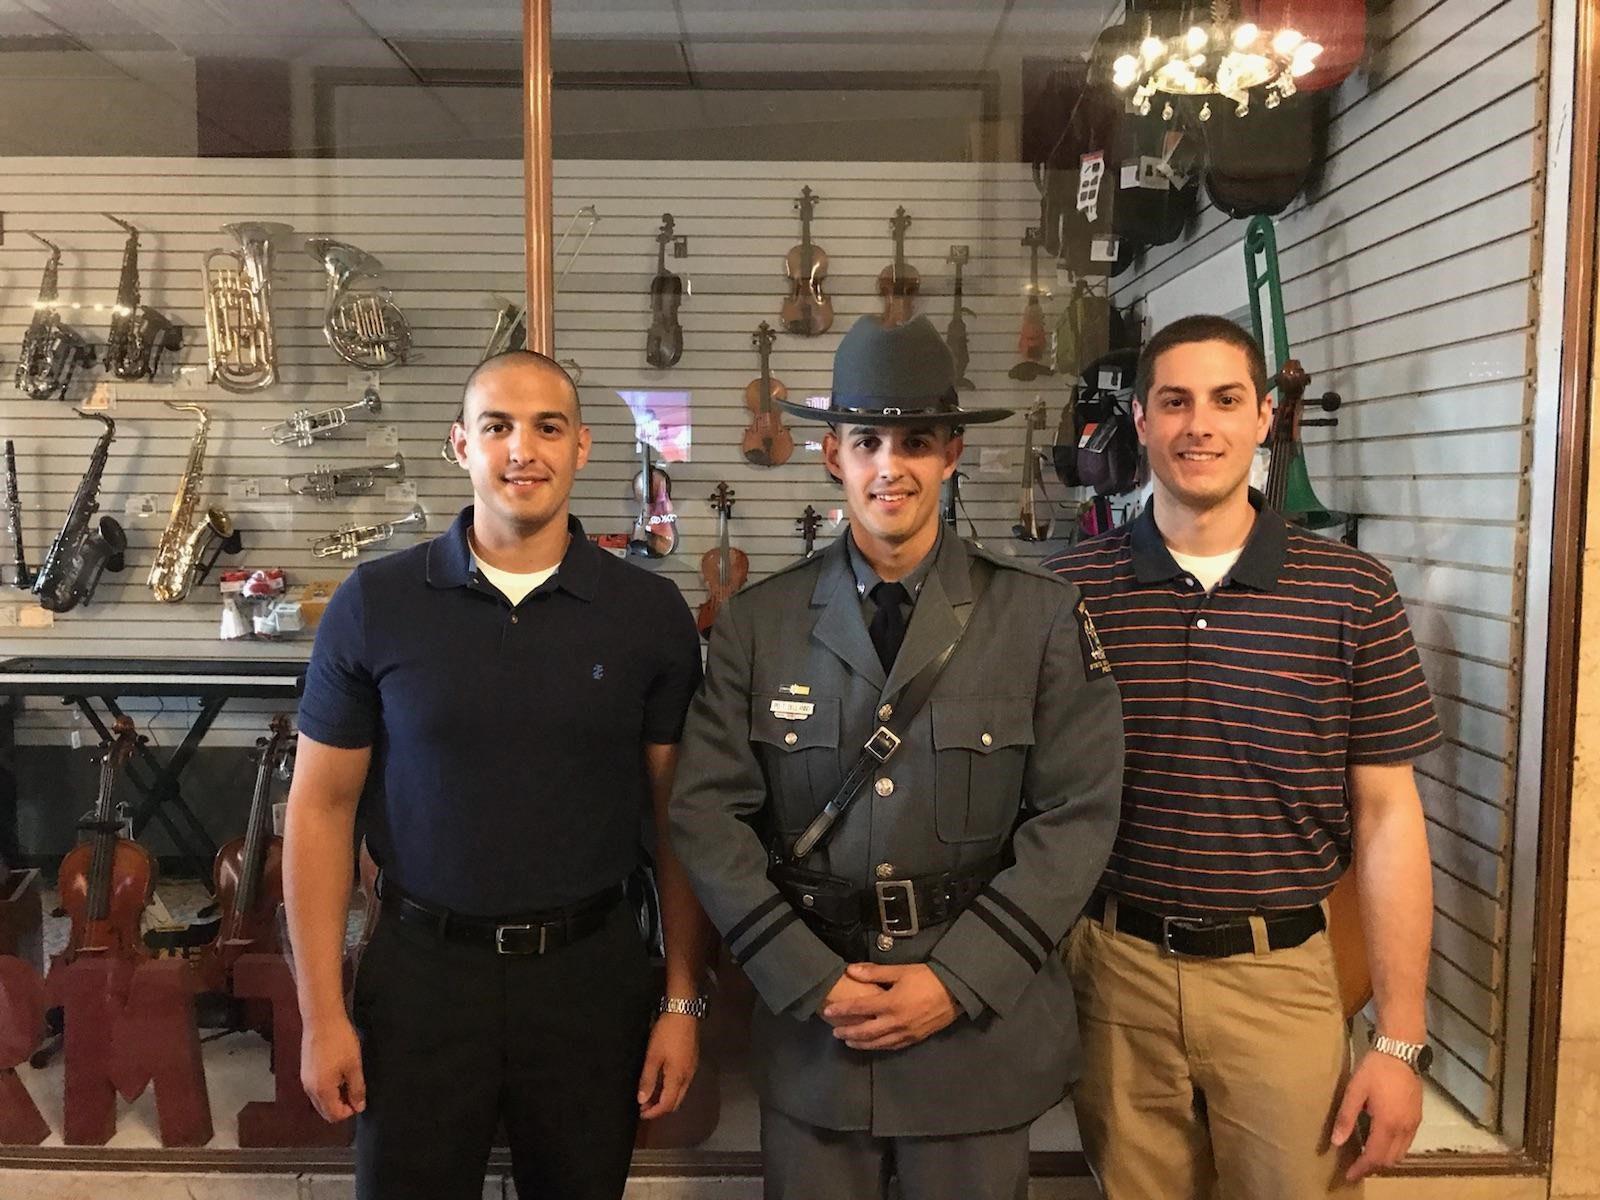 Congratulations Officer Tom Dell'Anno